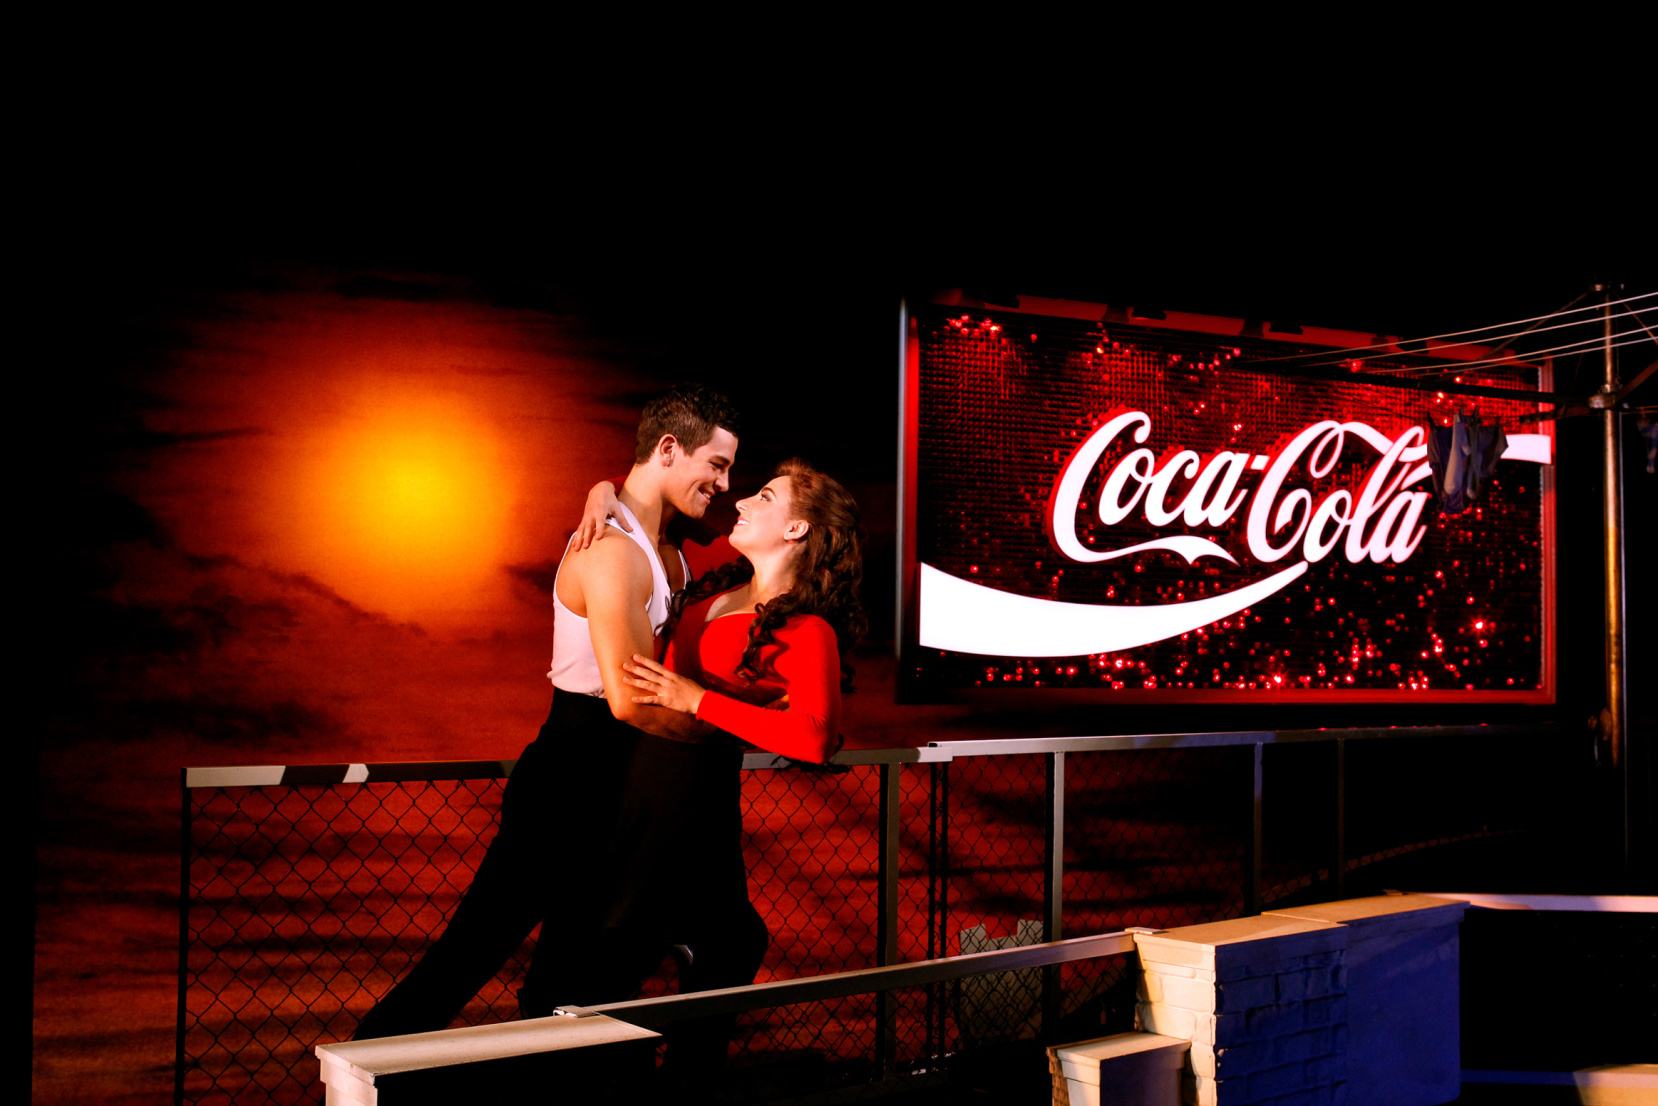 strictly-ballroom-musical-sydney-thomas-lacey-phoebe-panaretos-coca-cola-sign.jpg